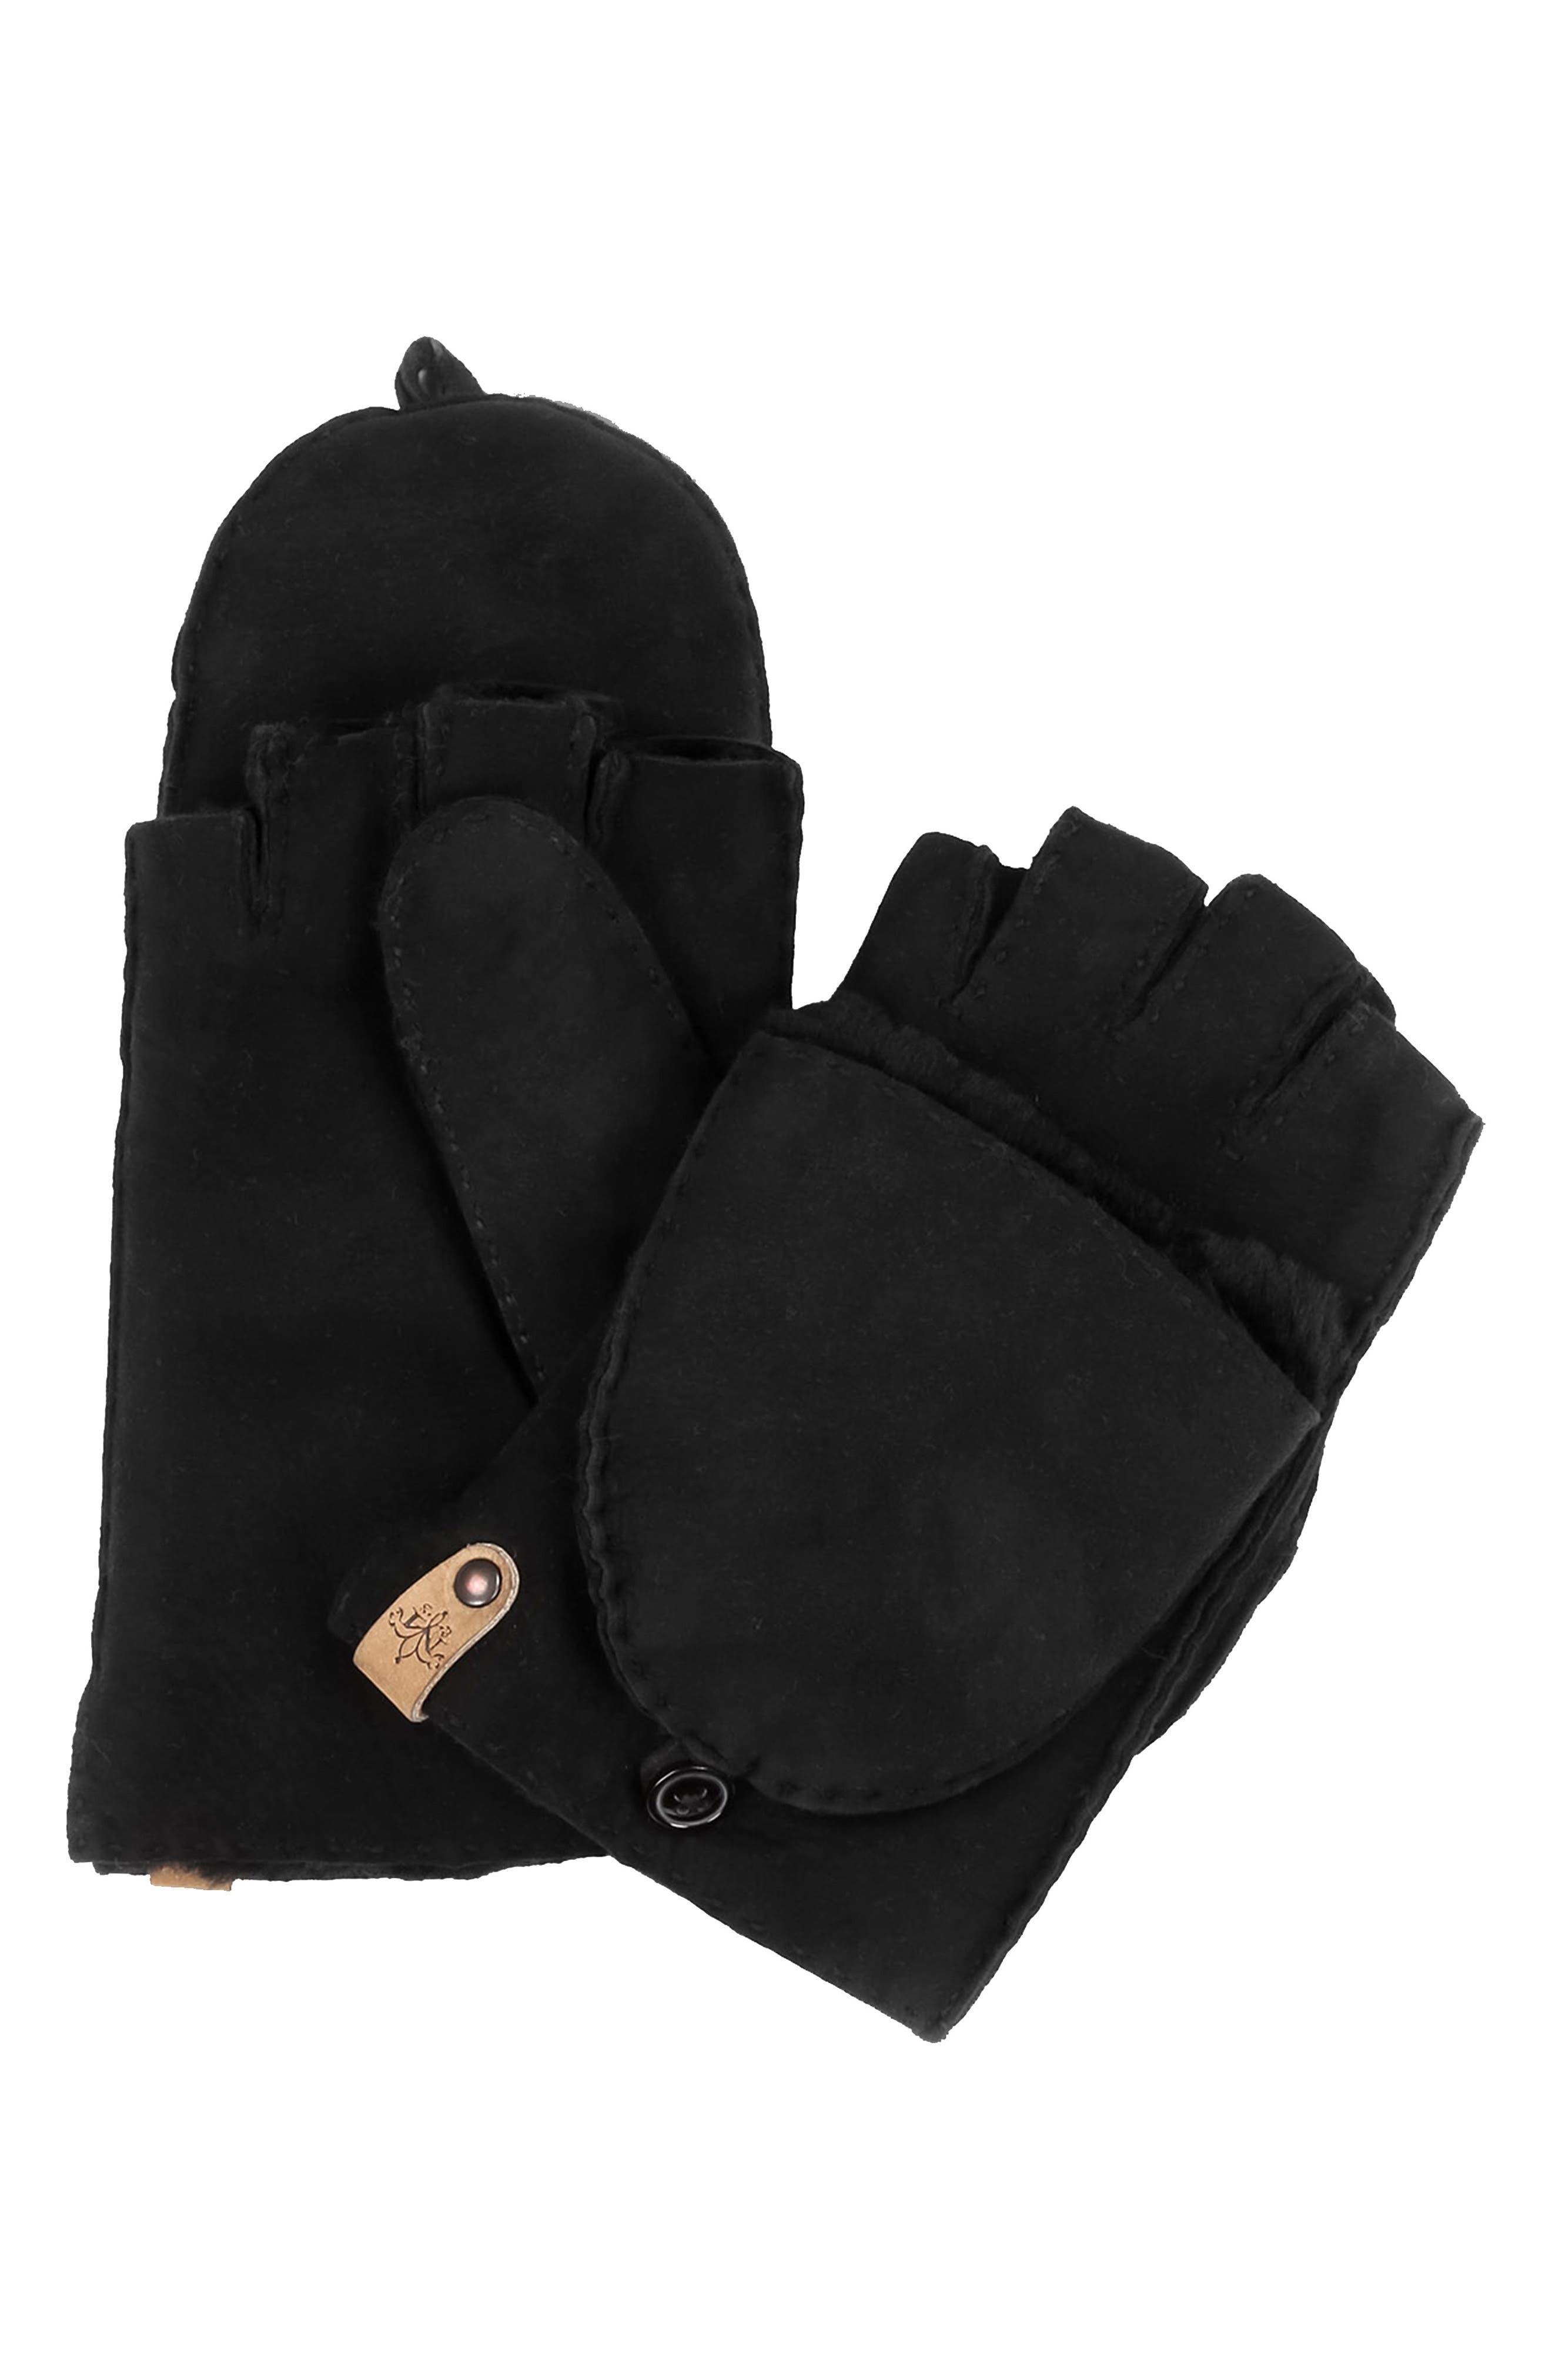 Orea Pop Top Sheepskin Leather Mittens,                         Main,                         color, BLACK